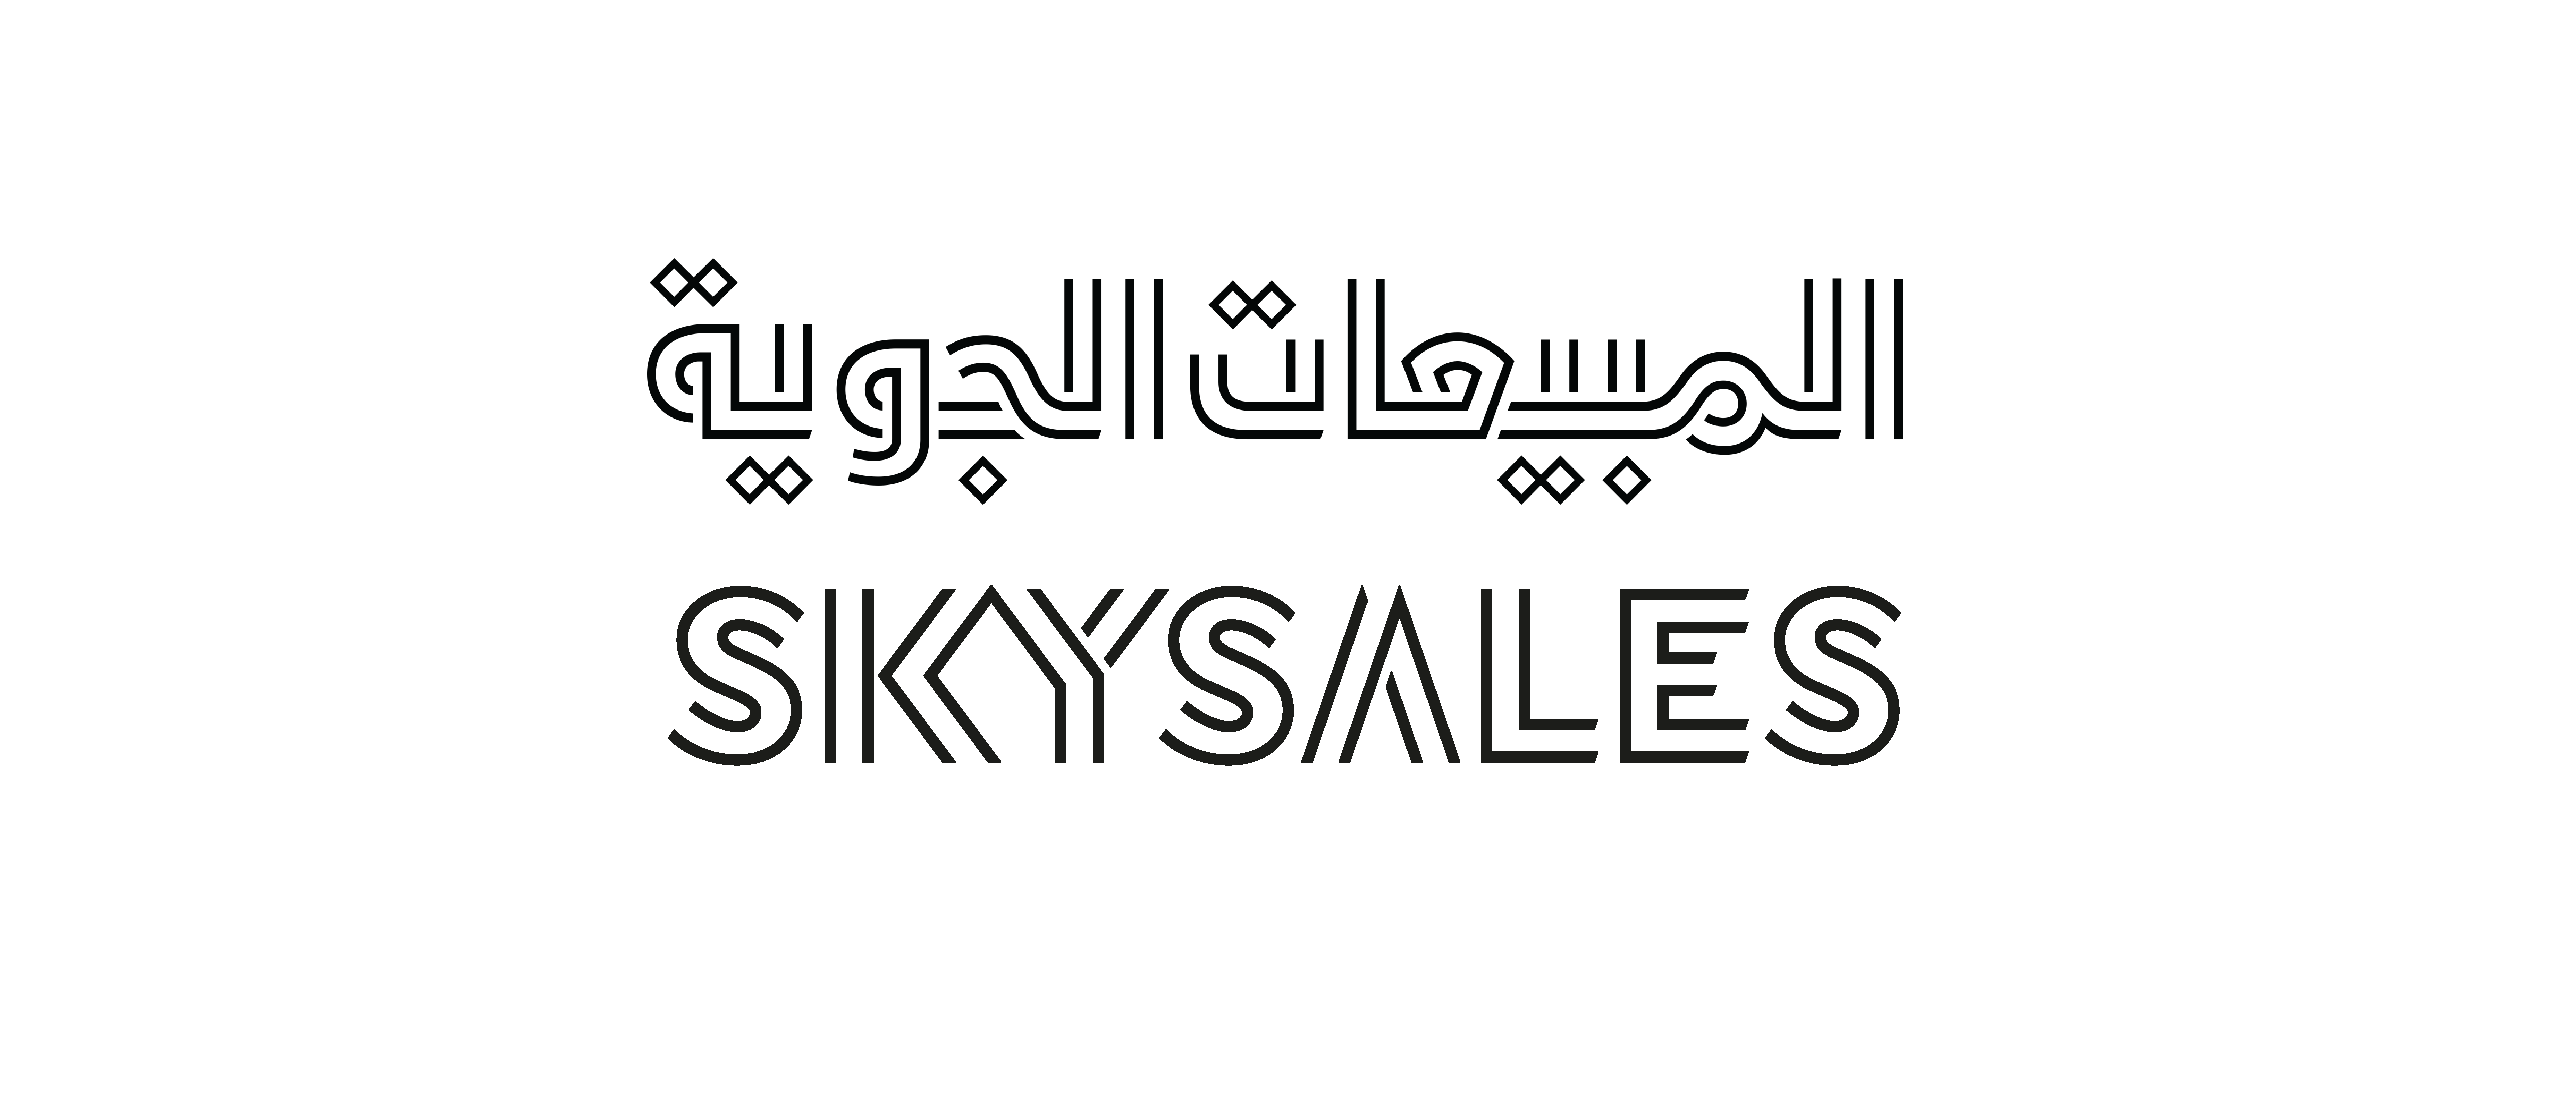 SkySales